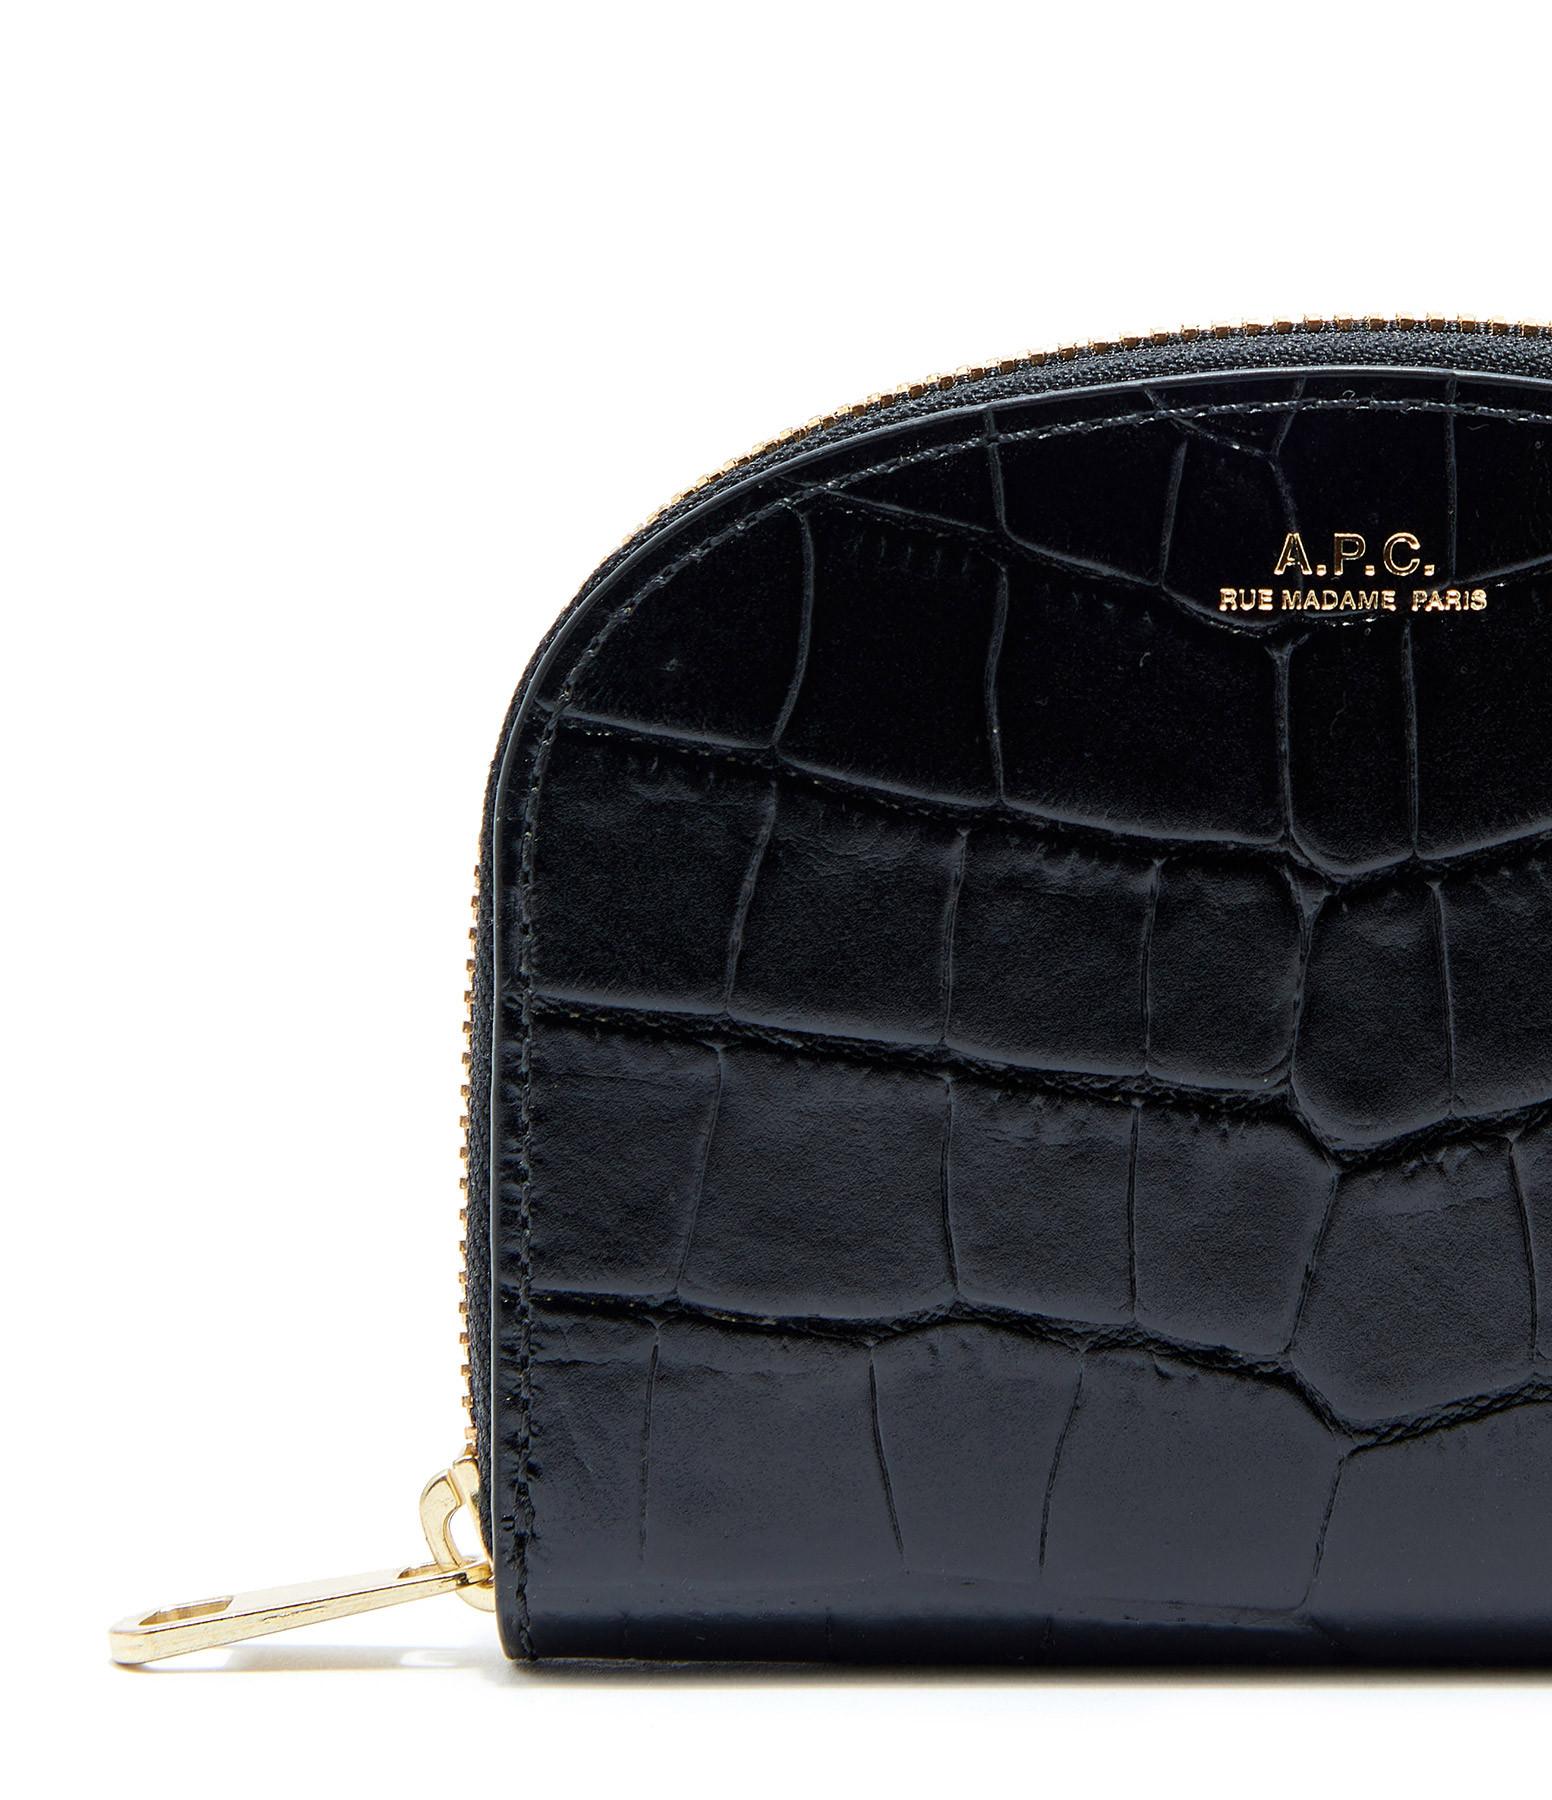 A.P.C. - Sac Compact Demi-Lune Cuir Embossé Croco Noir